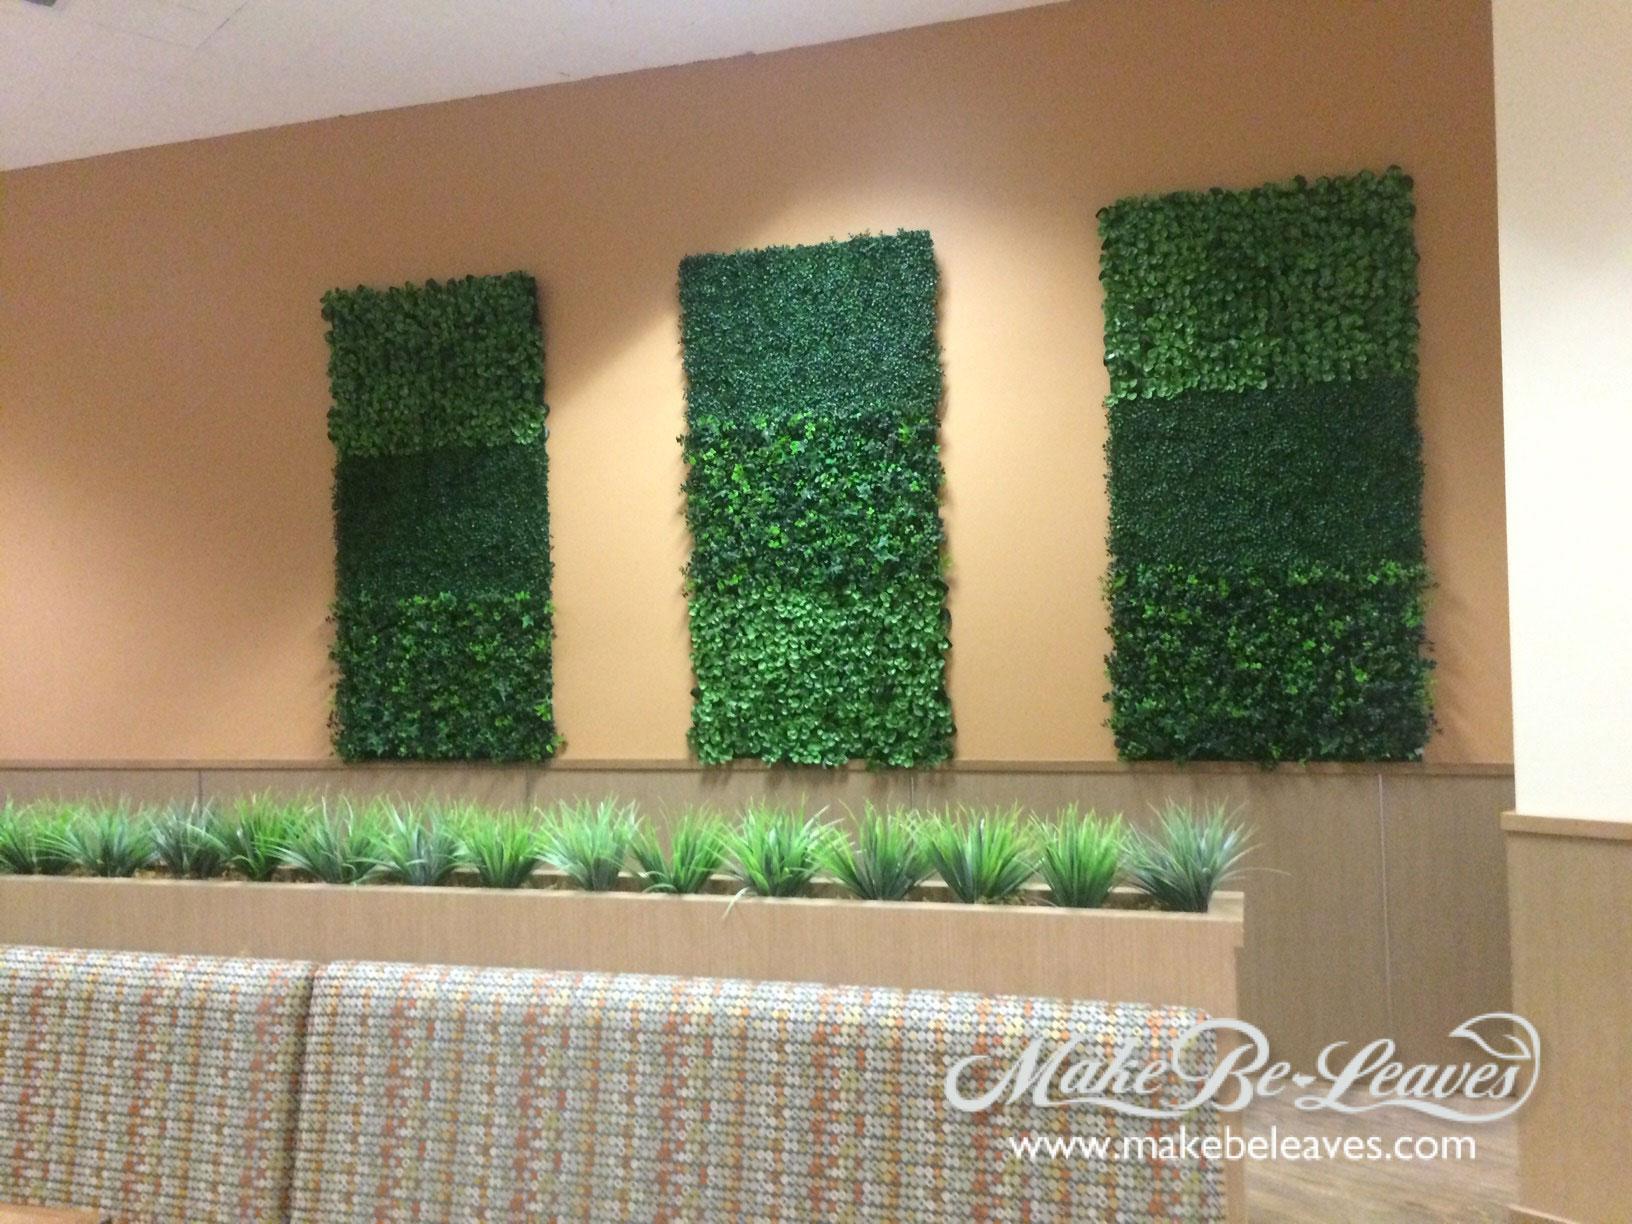 Make Be-Leaves Long-Beach-Memorial-Hosp-Cafe